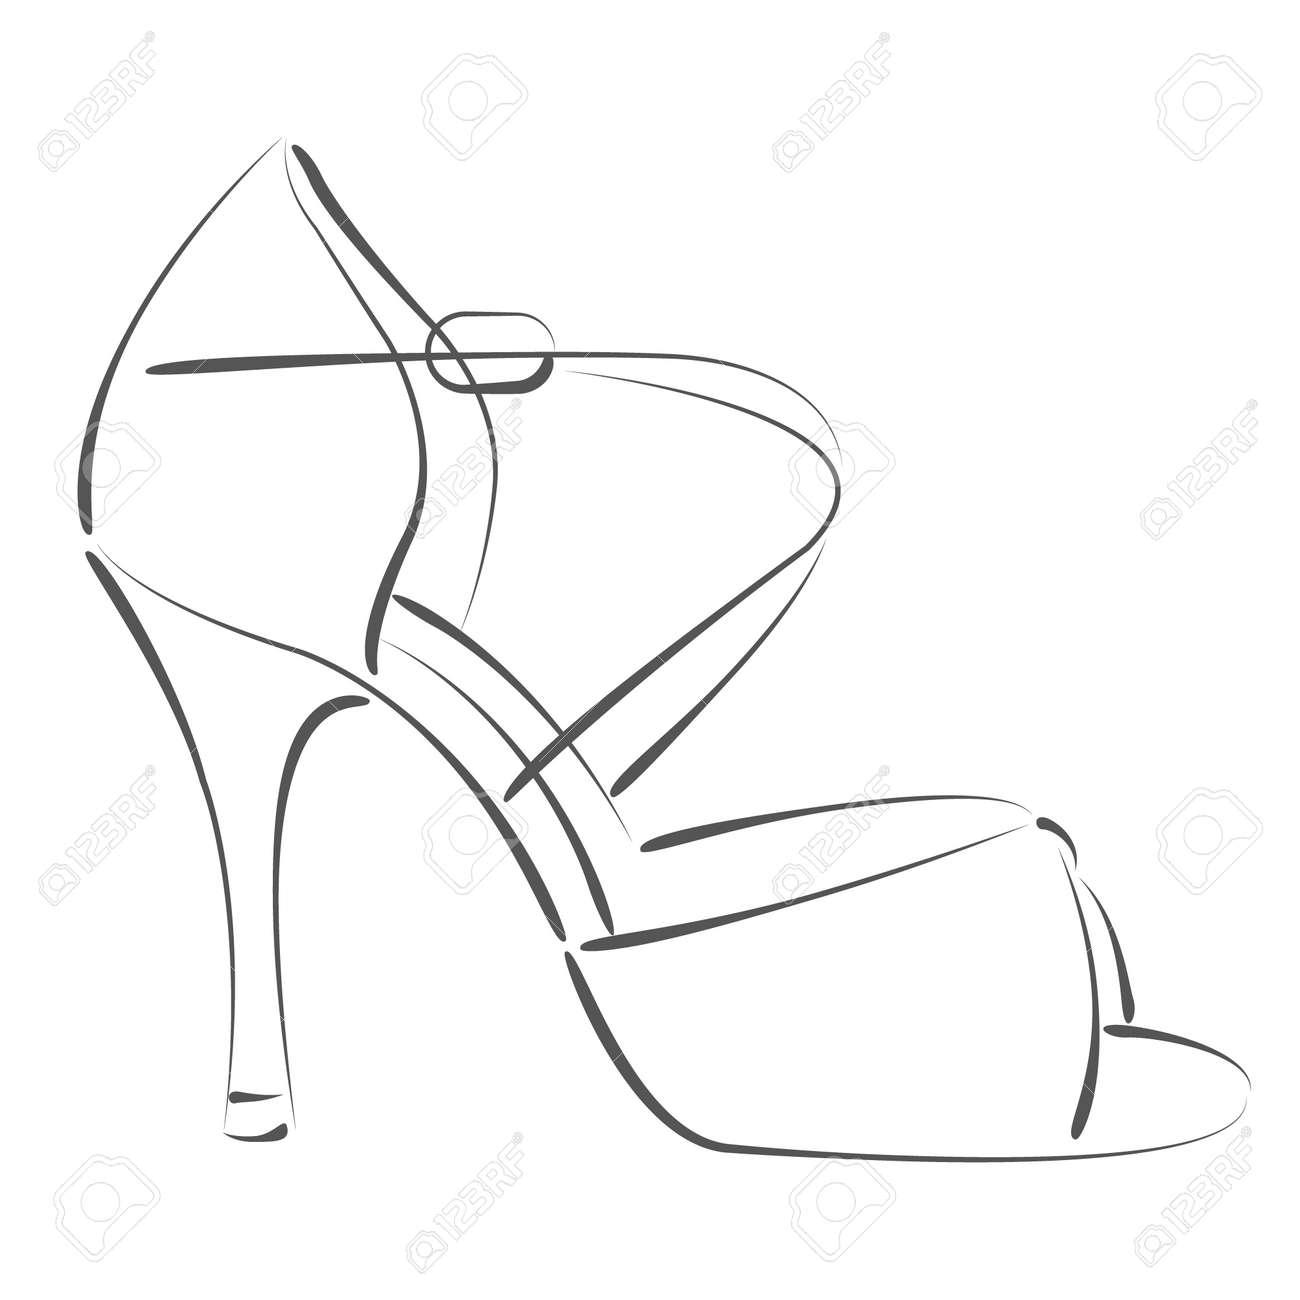 Elegant Sketched Woman S Shoe. Salsa Dance Shoes. Design Template ...